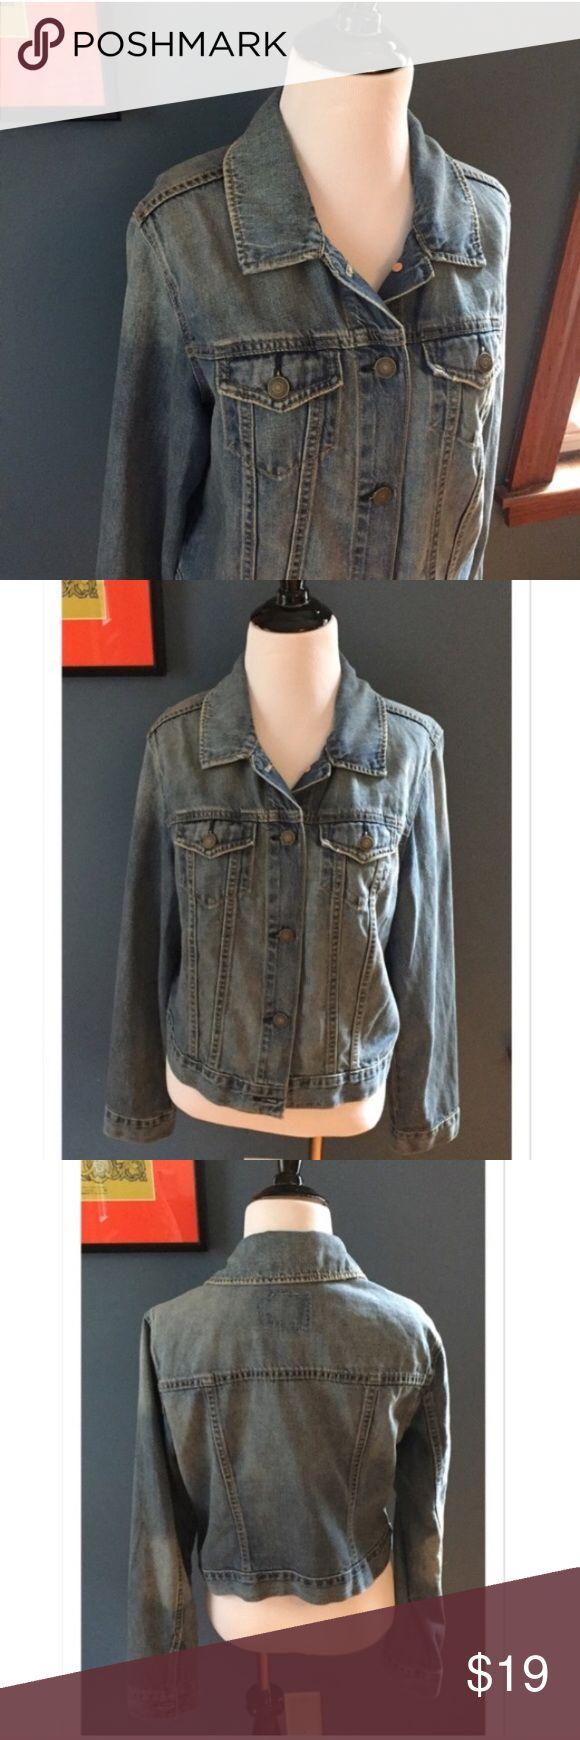 "Old Navy Jean Jacket Great denim jacket from Old Navy. 100% cotton. Shoulder 16""; Bust 21"" across, armpit to armpit; Length 20.5""; Sleeve 24.5"". EUC Old Navy Jackets & Coats Jean Jackets"